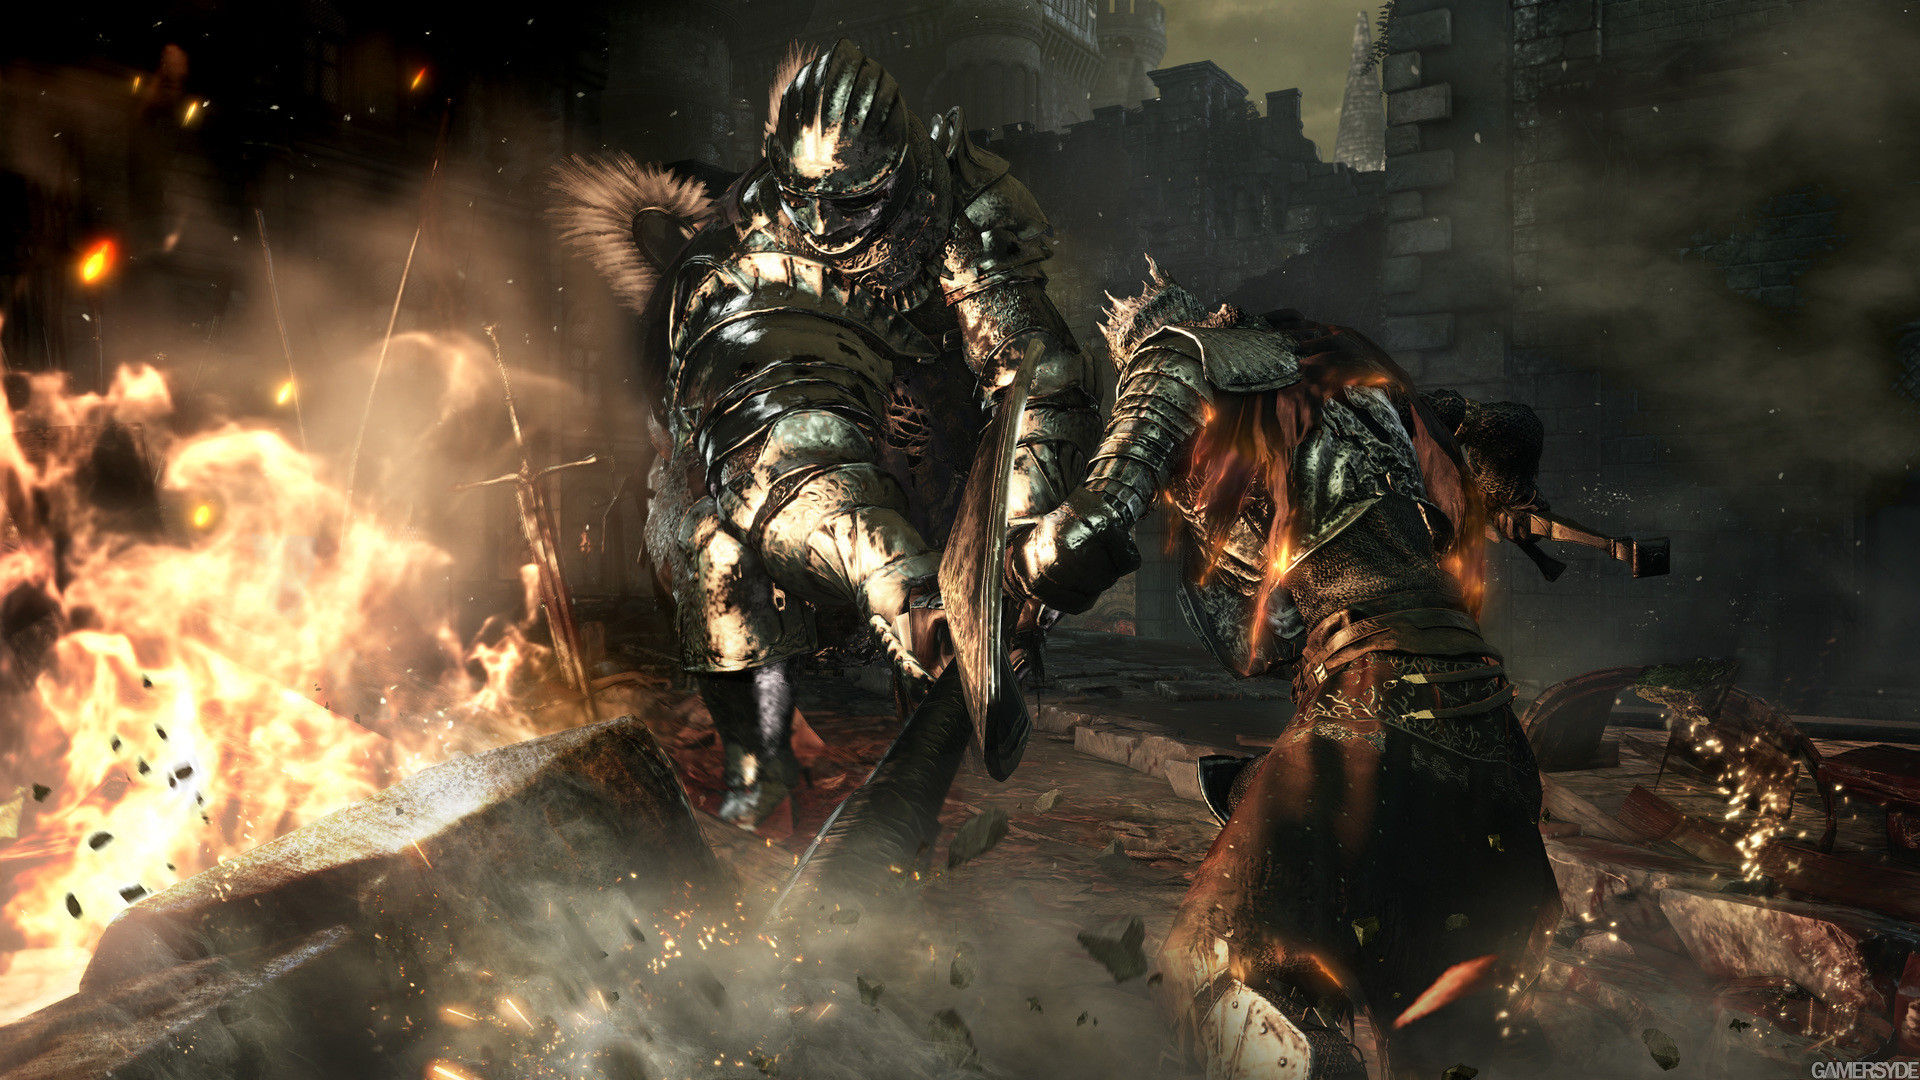 Dark Souls 3 Screenshoot HD Wallpaper